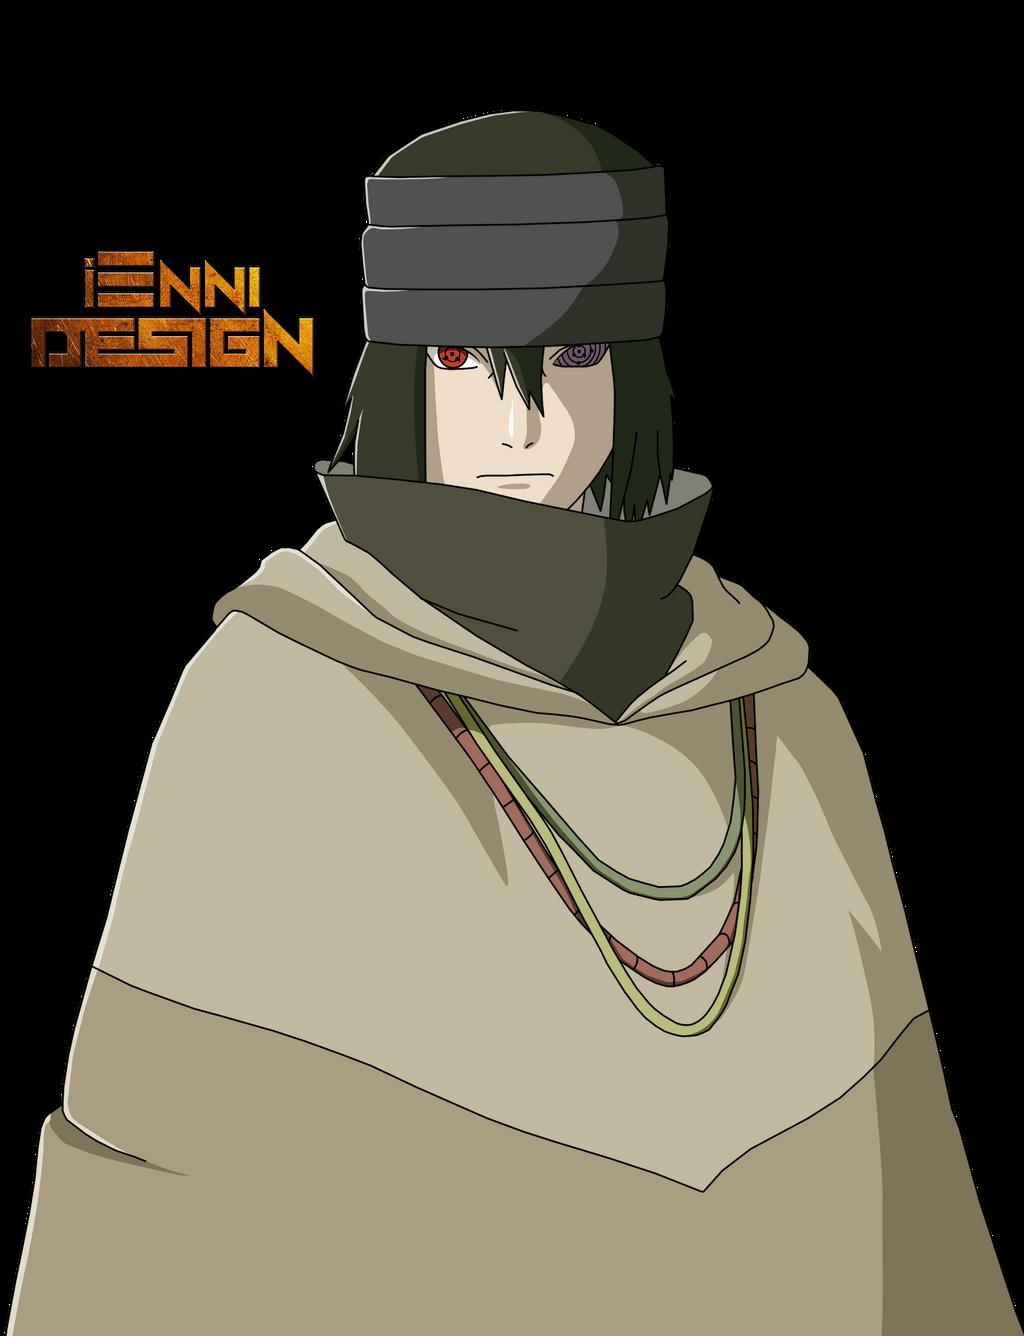 F.A.B.O. Hunters Naruto_storm_4__sasuke_uchiha__the_last__movie__by_iennidesign-d9lp3nl